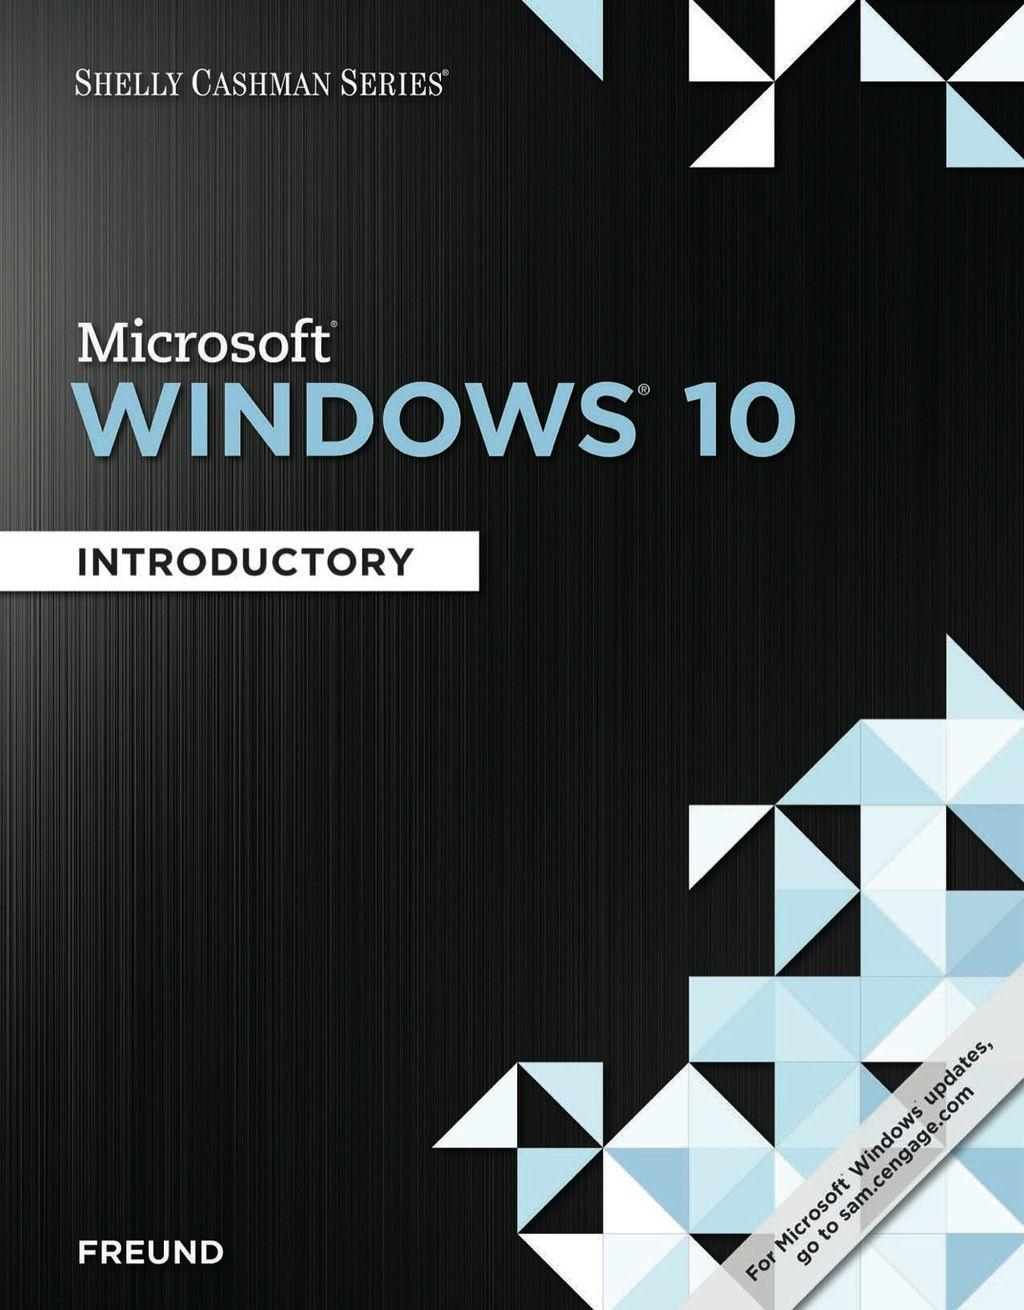 Shelly Cashman Series Microsoft Windows 10 Introductory Ebook Rental Microsoft Windows Windows 10 Microsoft